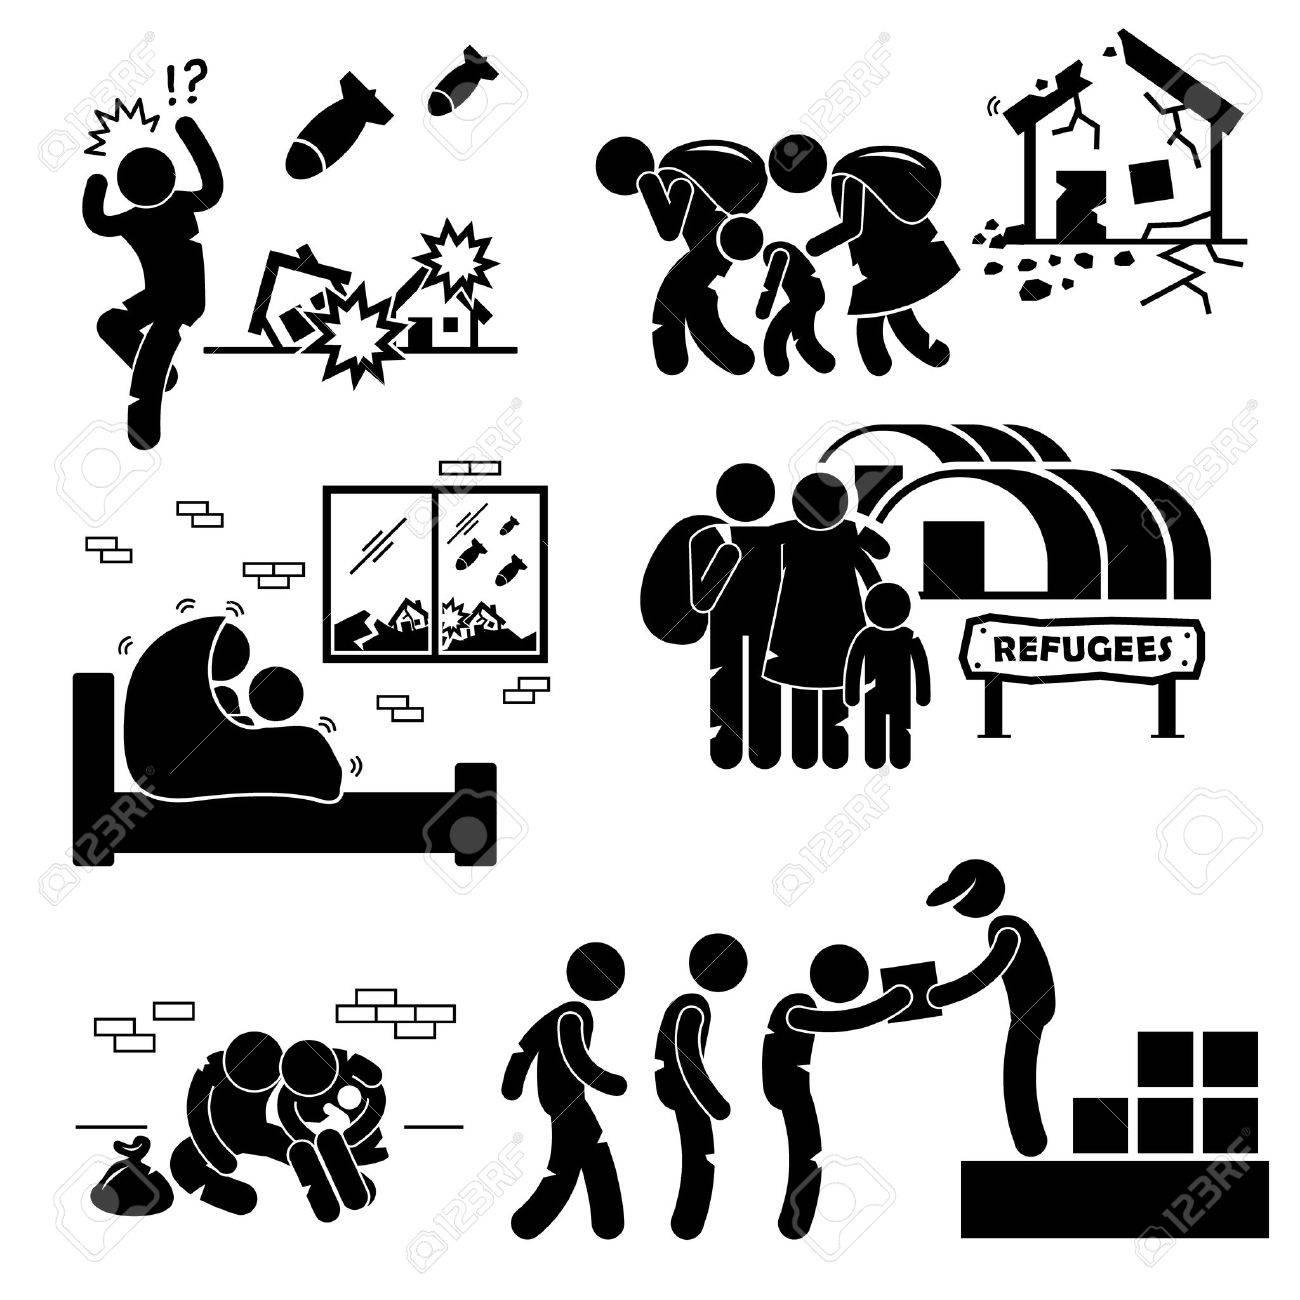 Refugees Evacuee War Stick Figure Pictogram Icons - 31542644